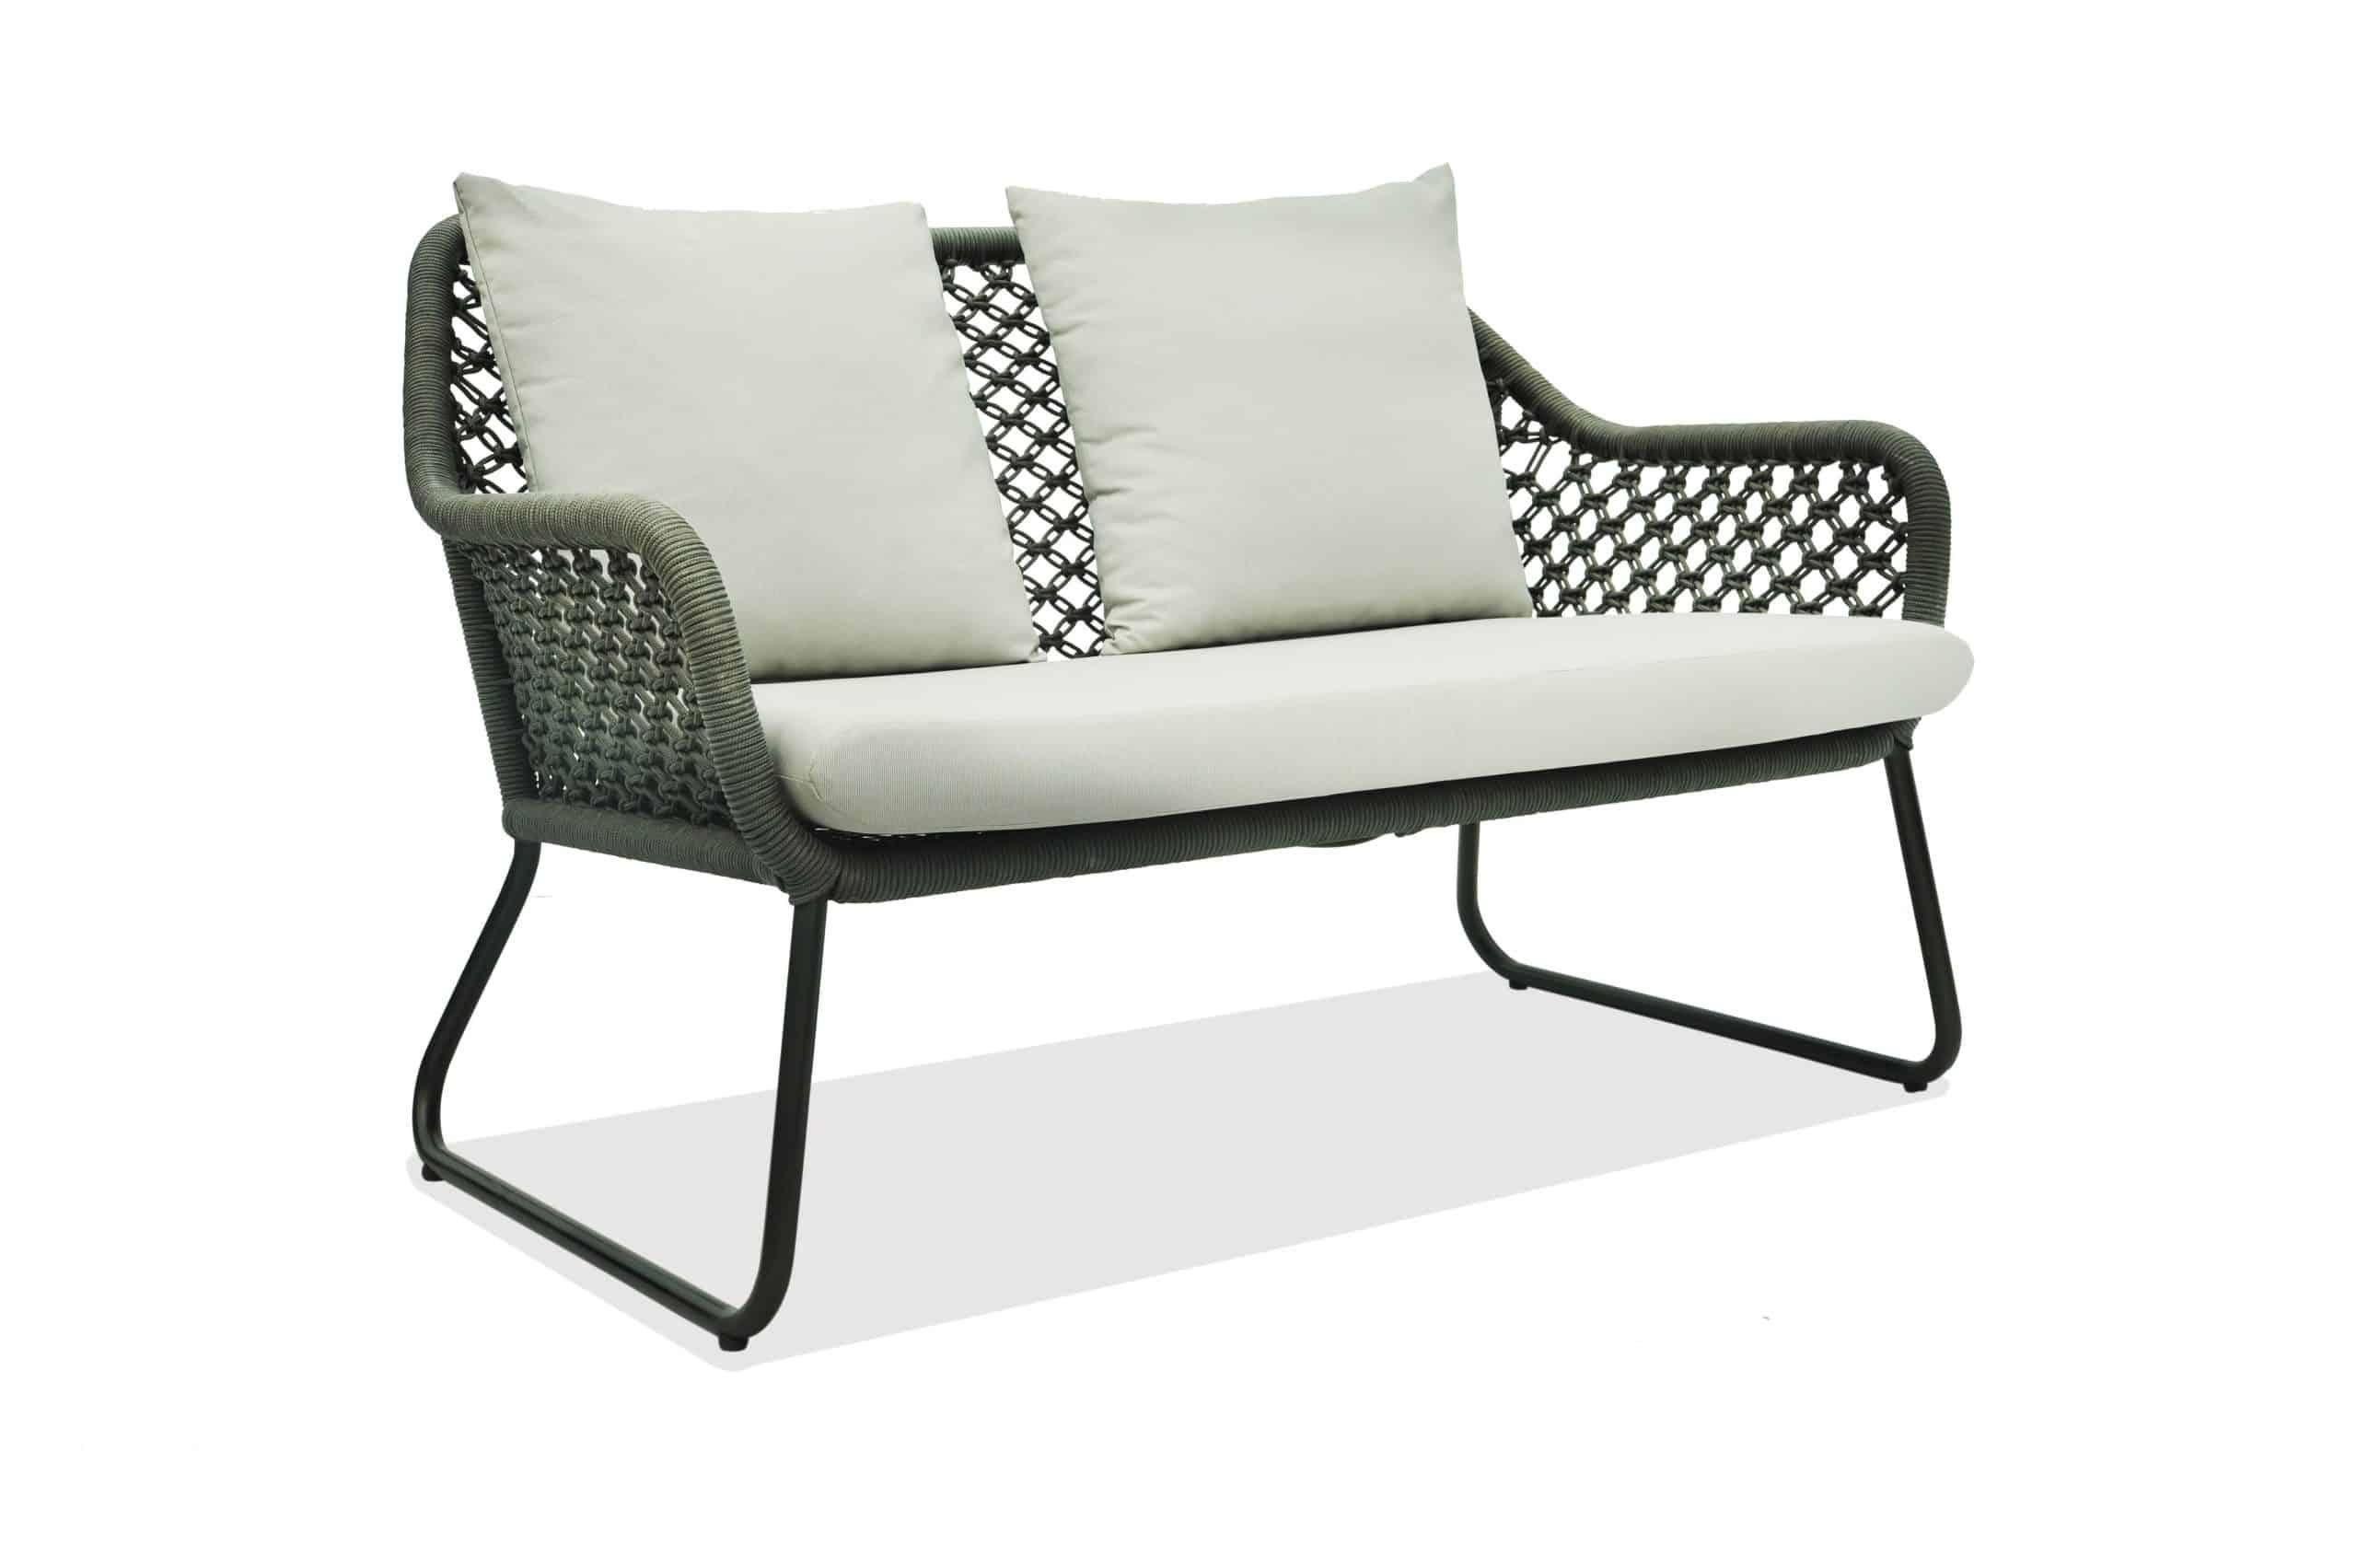 palma two seater outdoor sofa